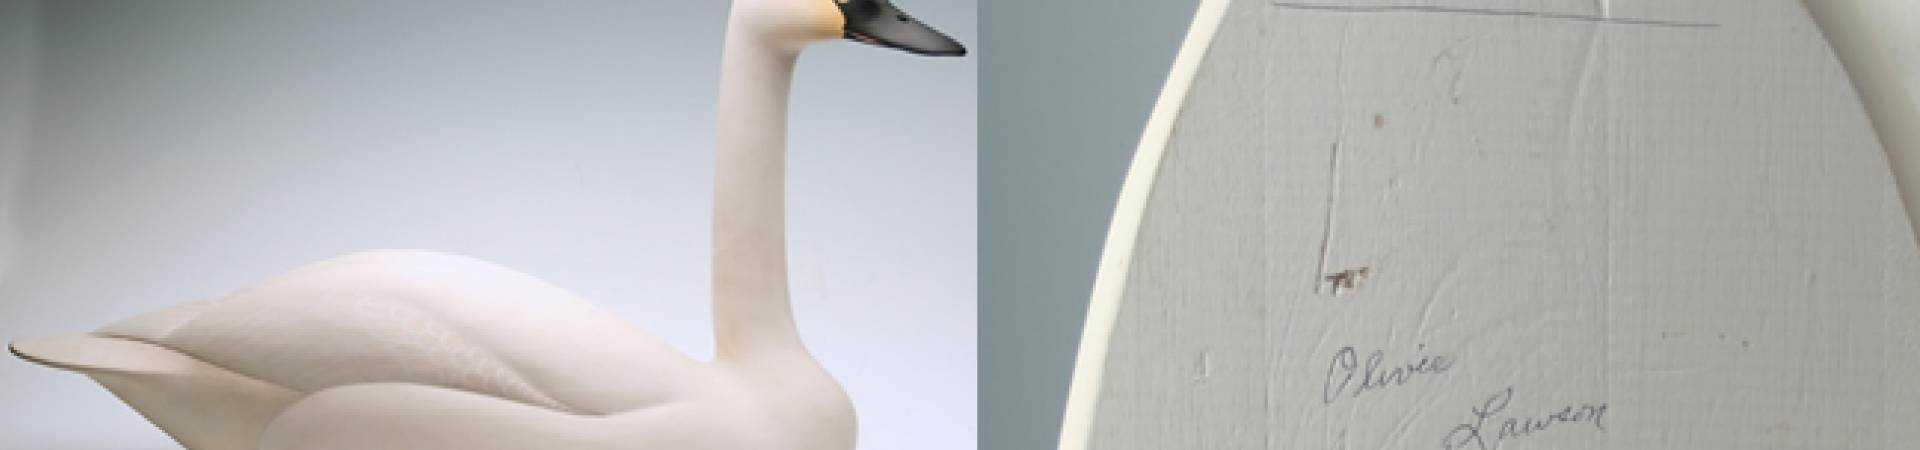 Swan-decoy-oliver-larson